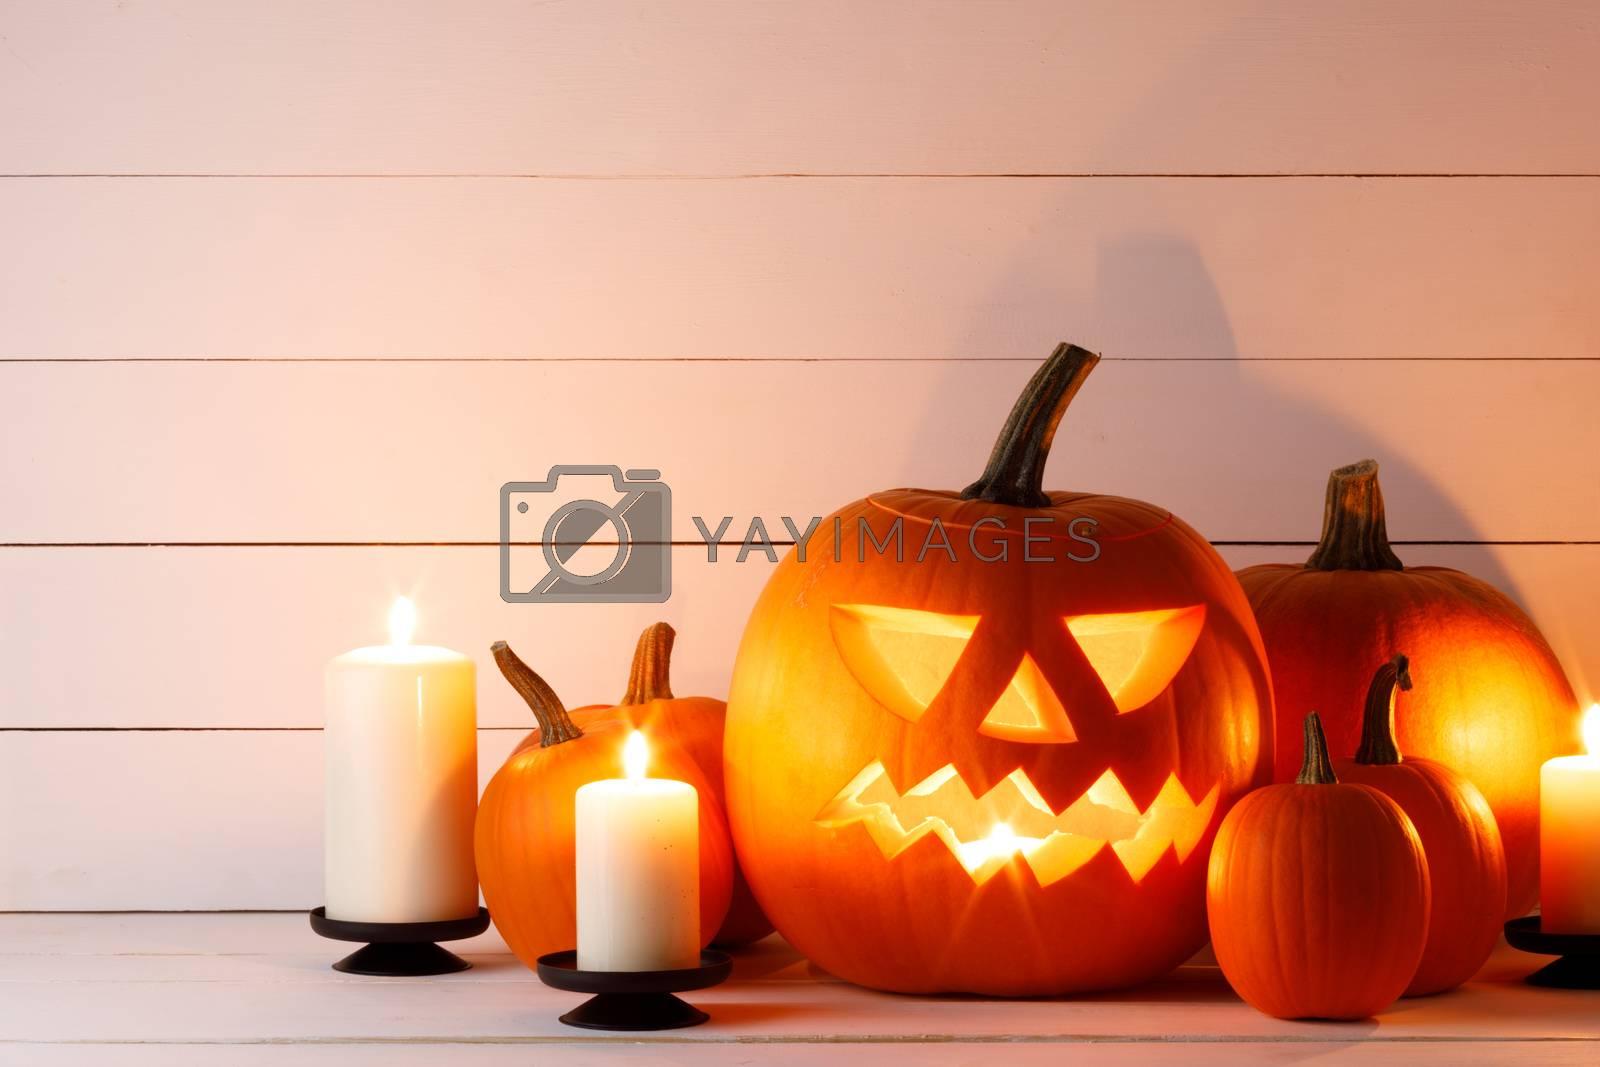 Halloween pumpkin head jack lantern and candles on light wooden background